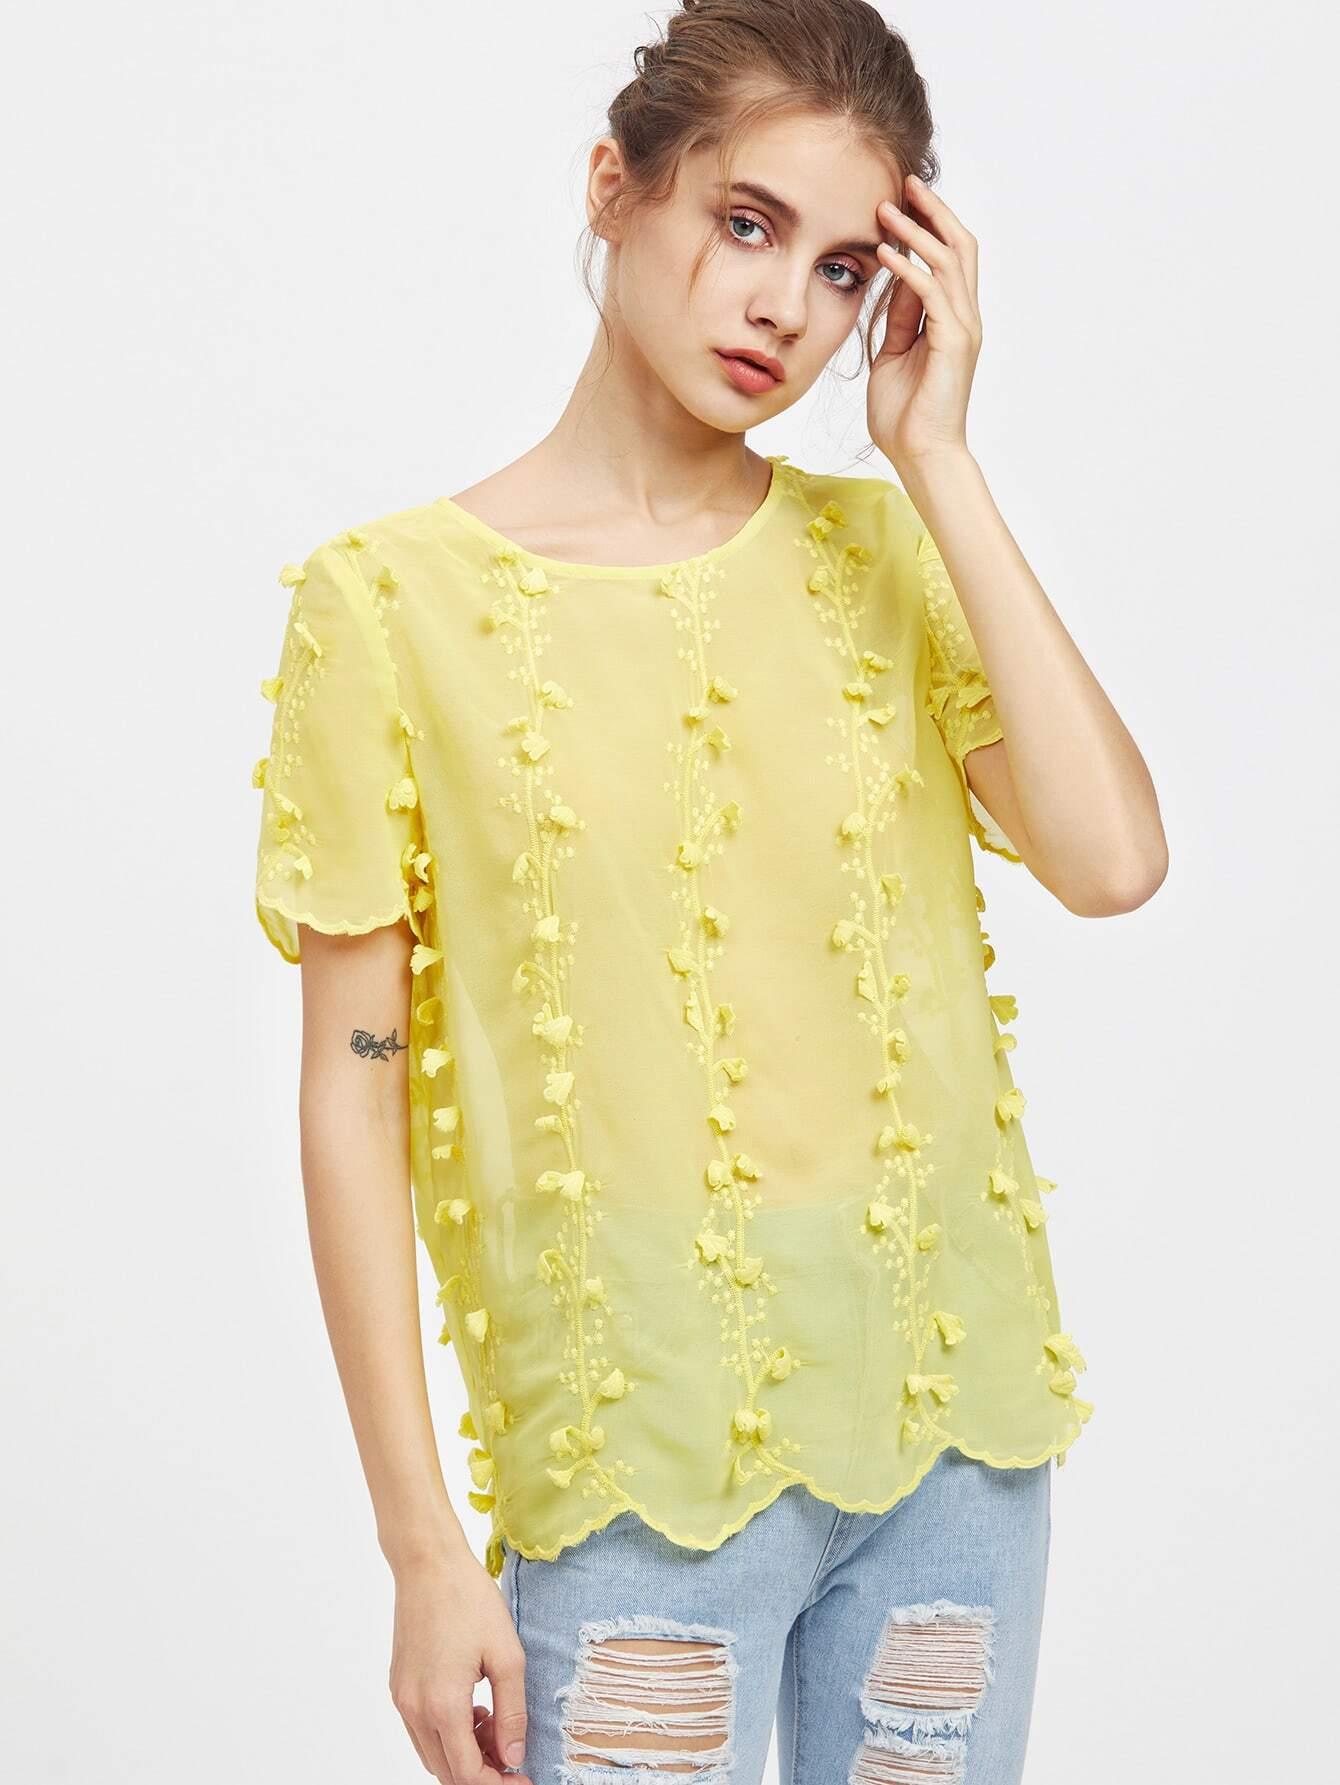 Фото Vine Applique Scallop Edge Embroidered Semi Sheer Top. Купить с доставкой